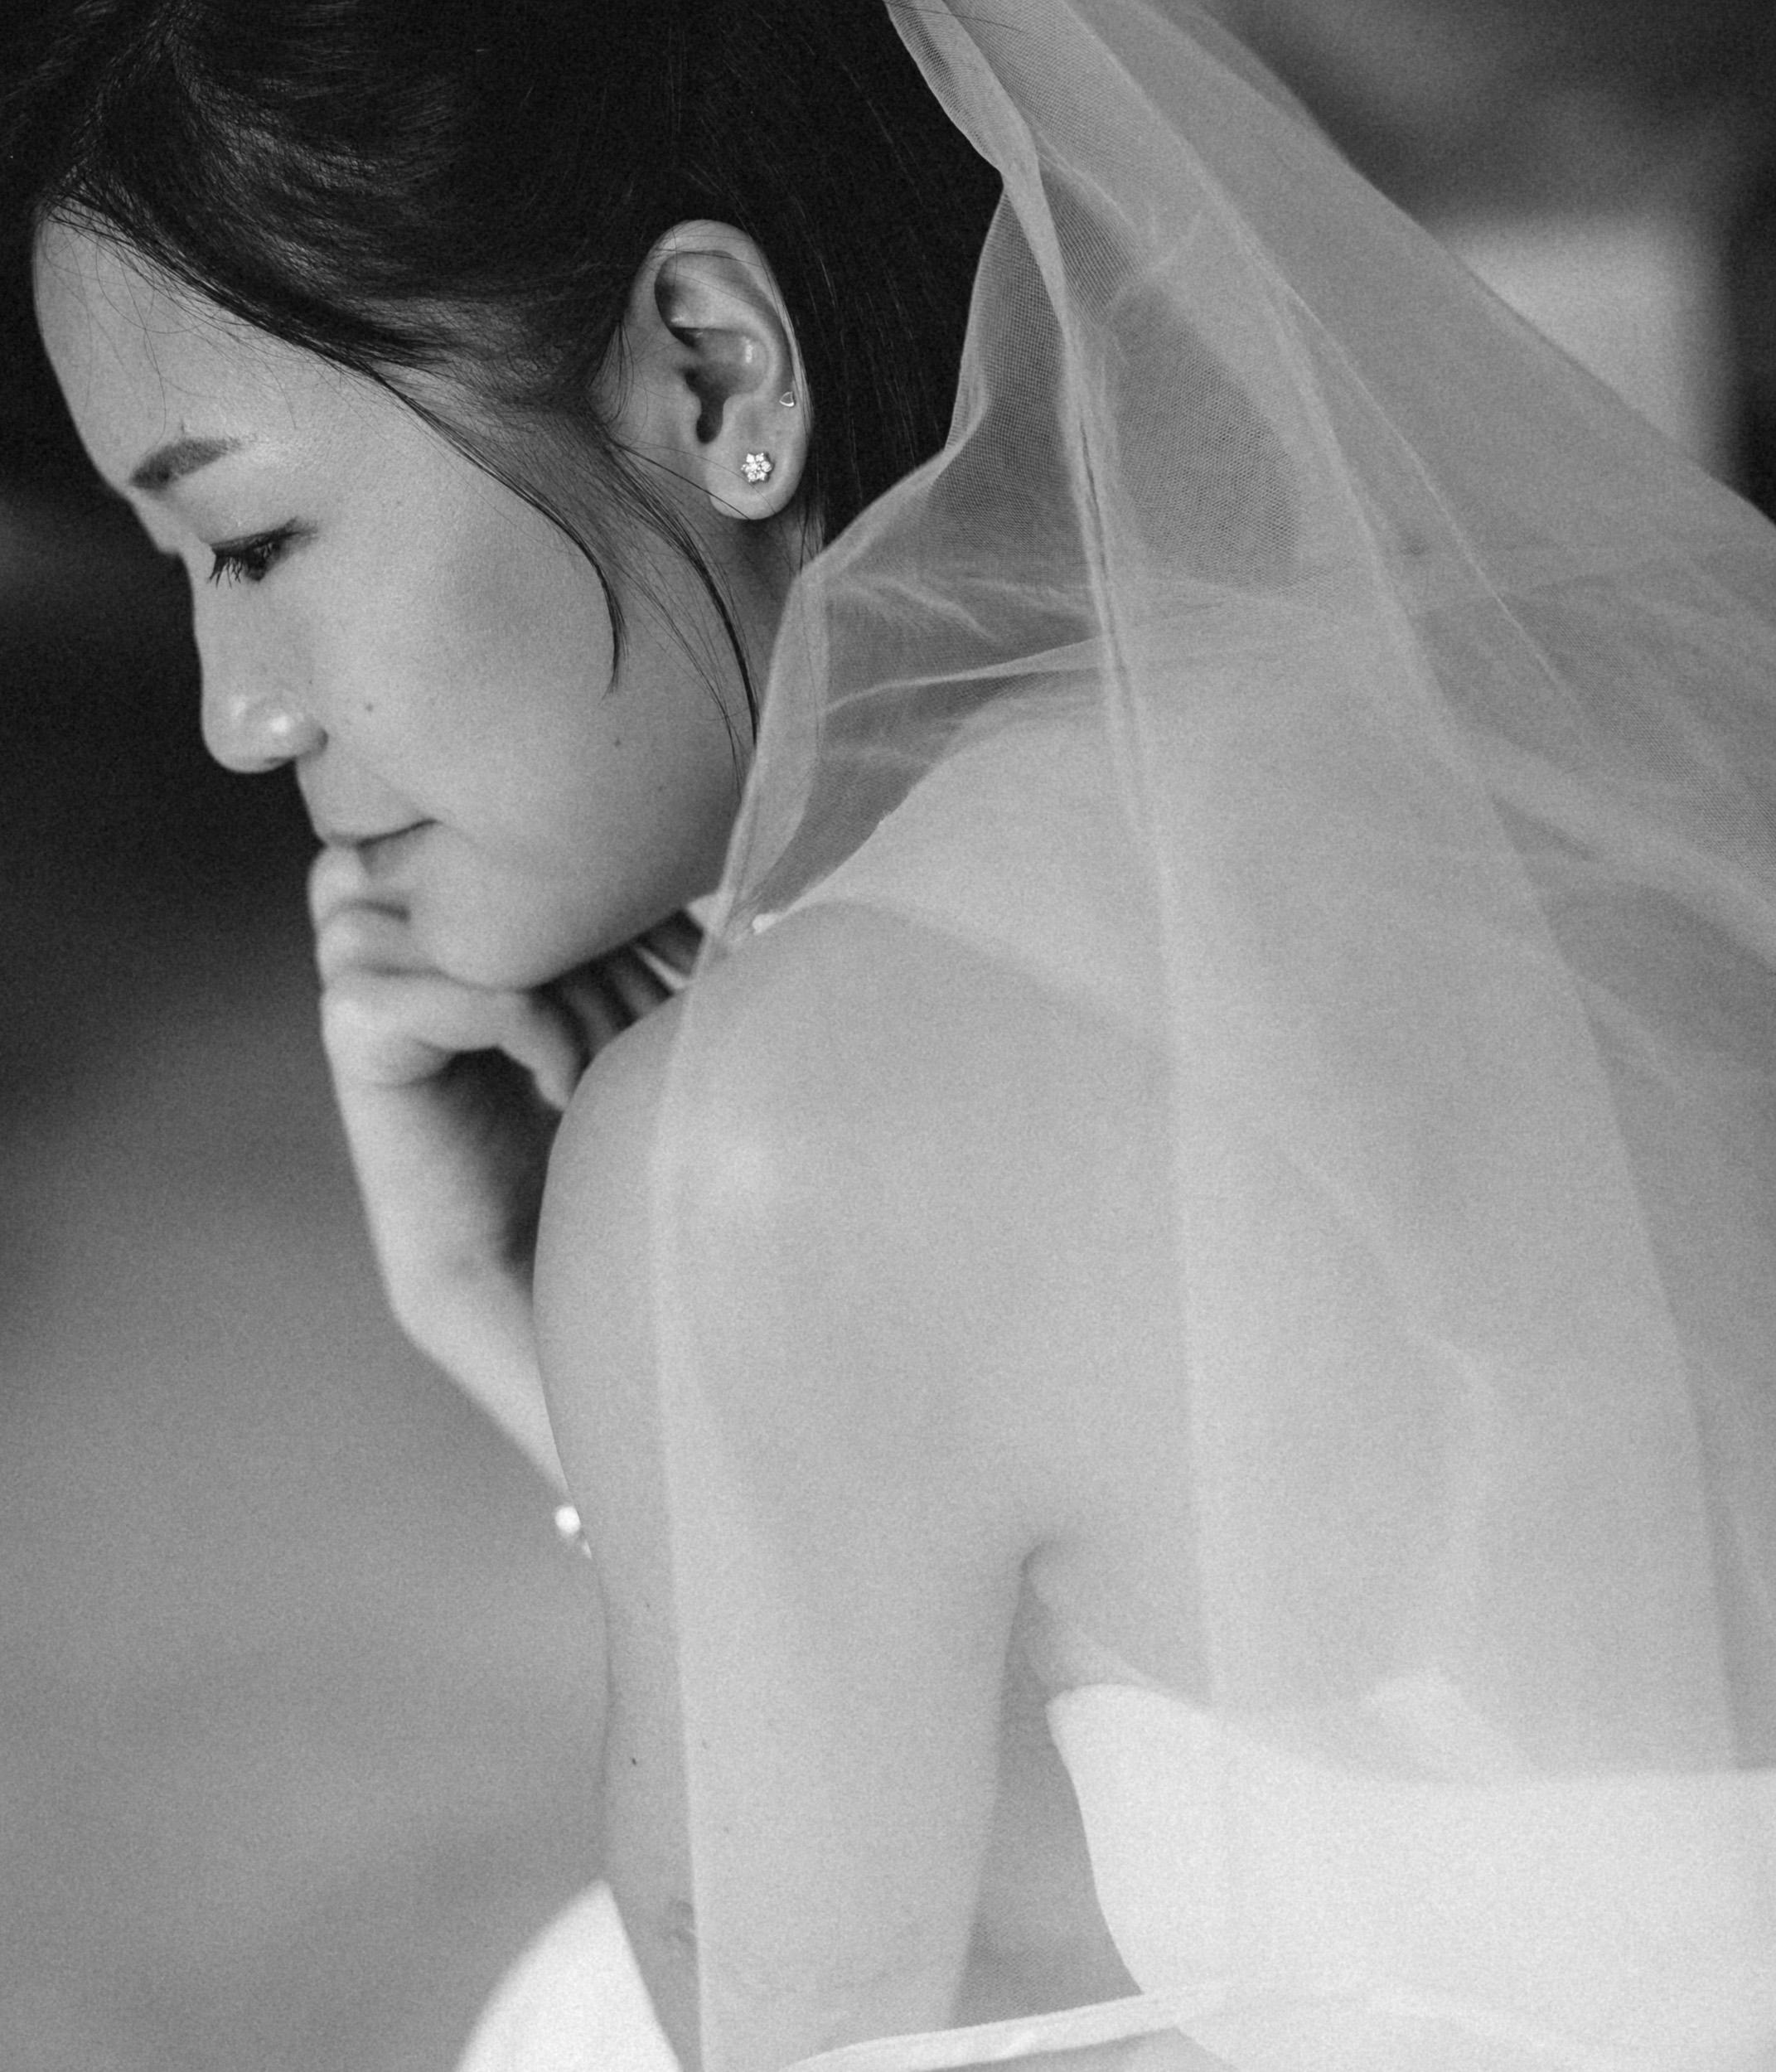 singapore-wedding-photographer-photography-wmt2017-057.jpg